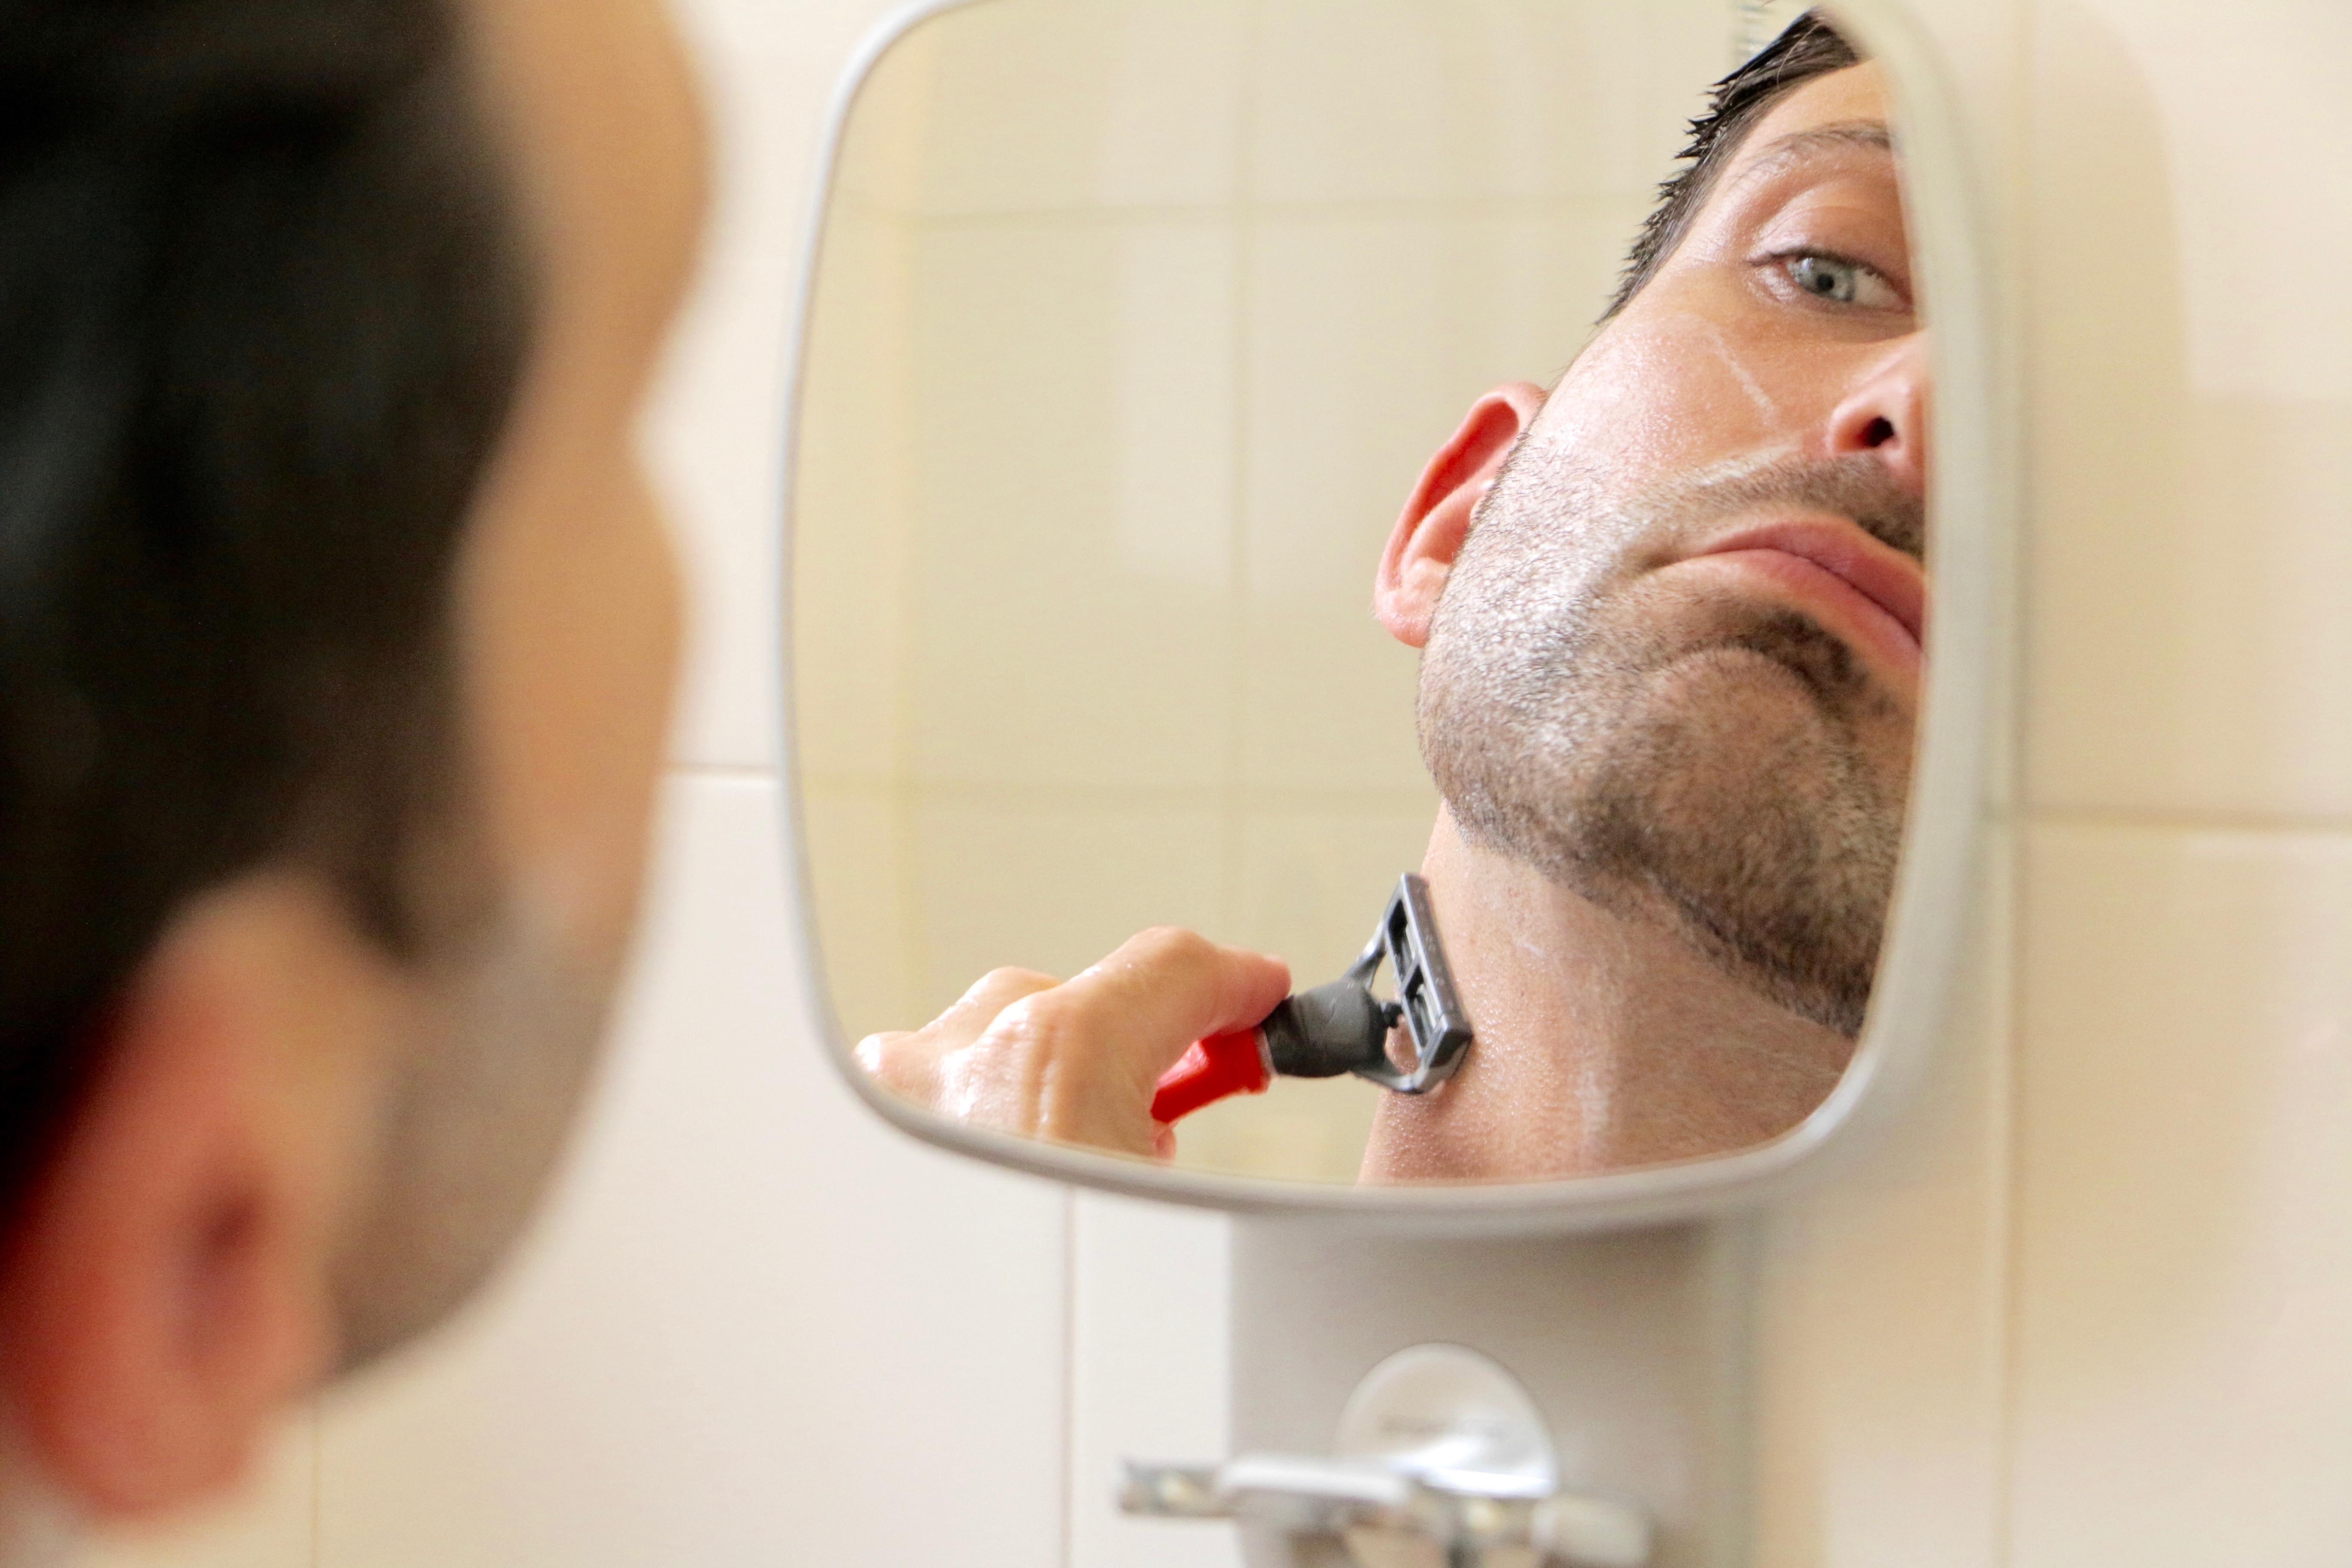 Shaving 12